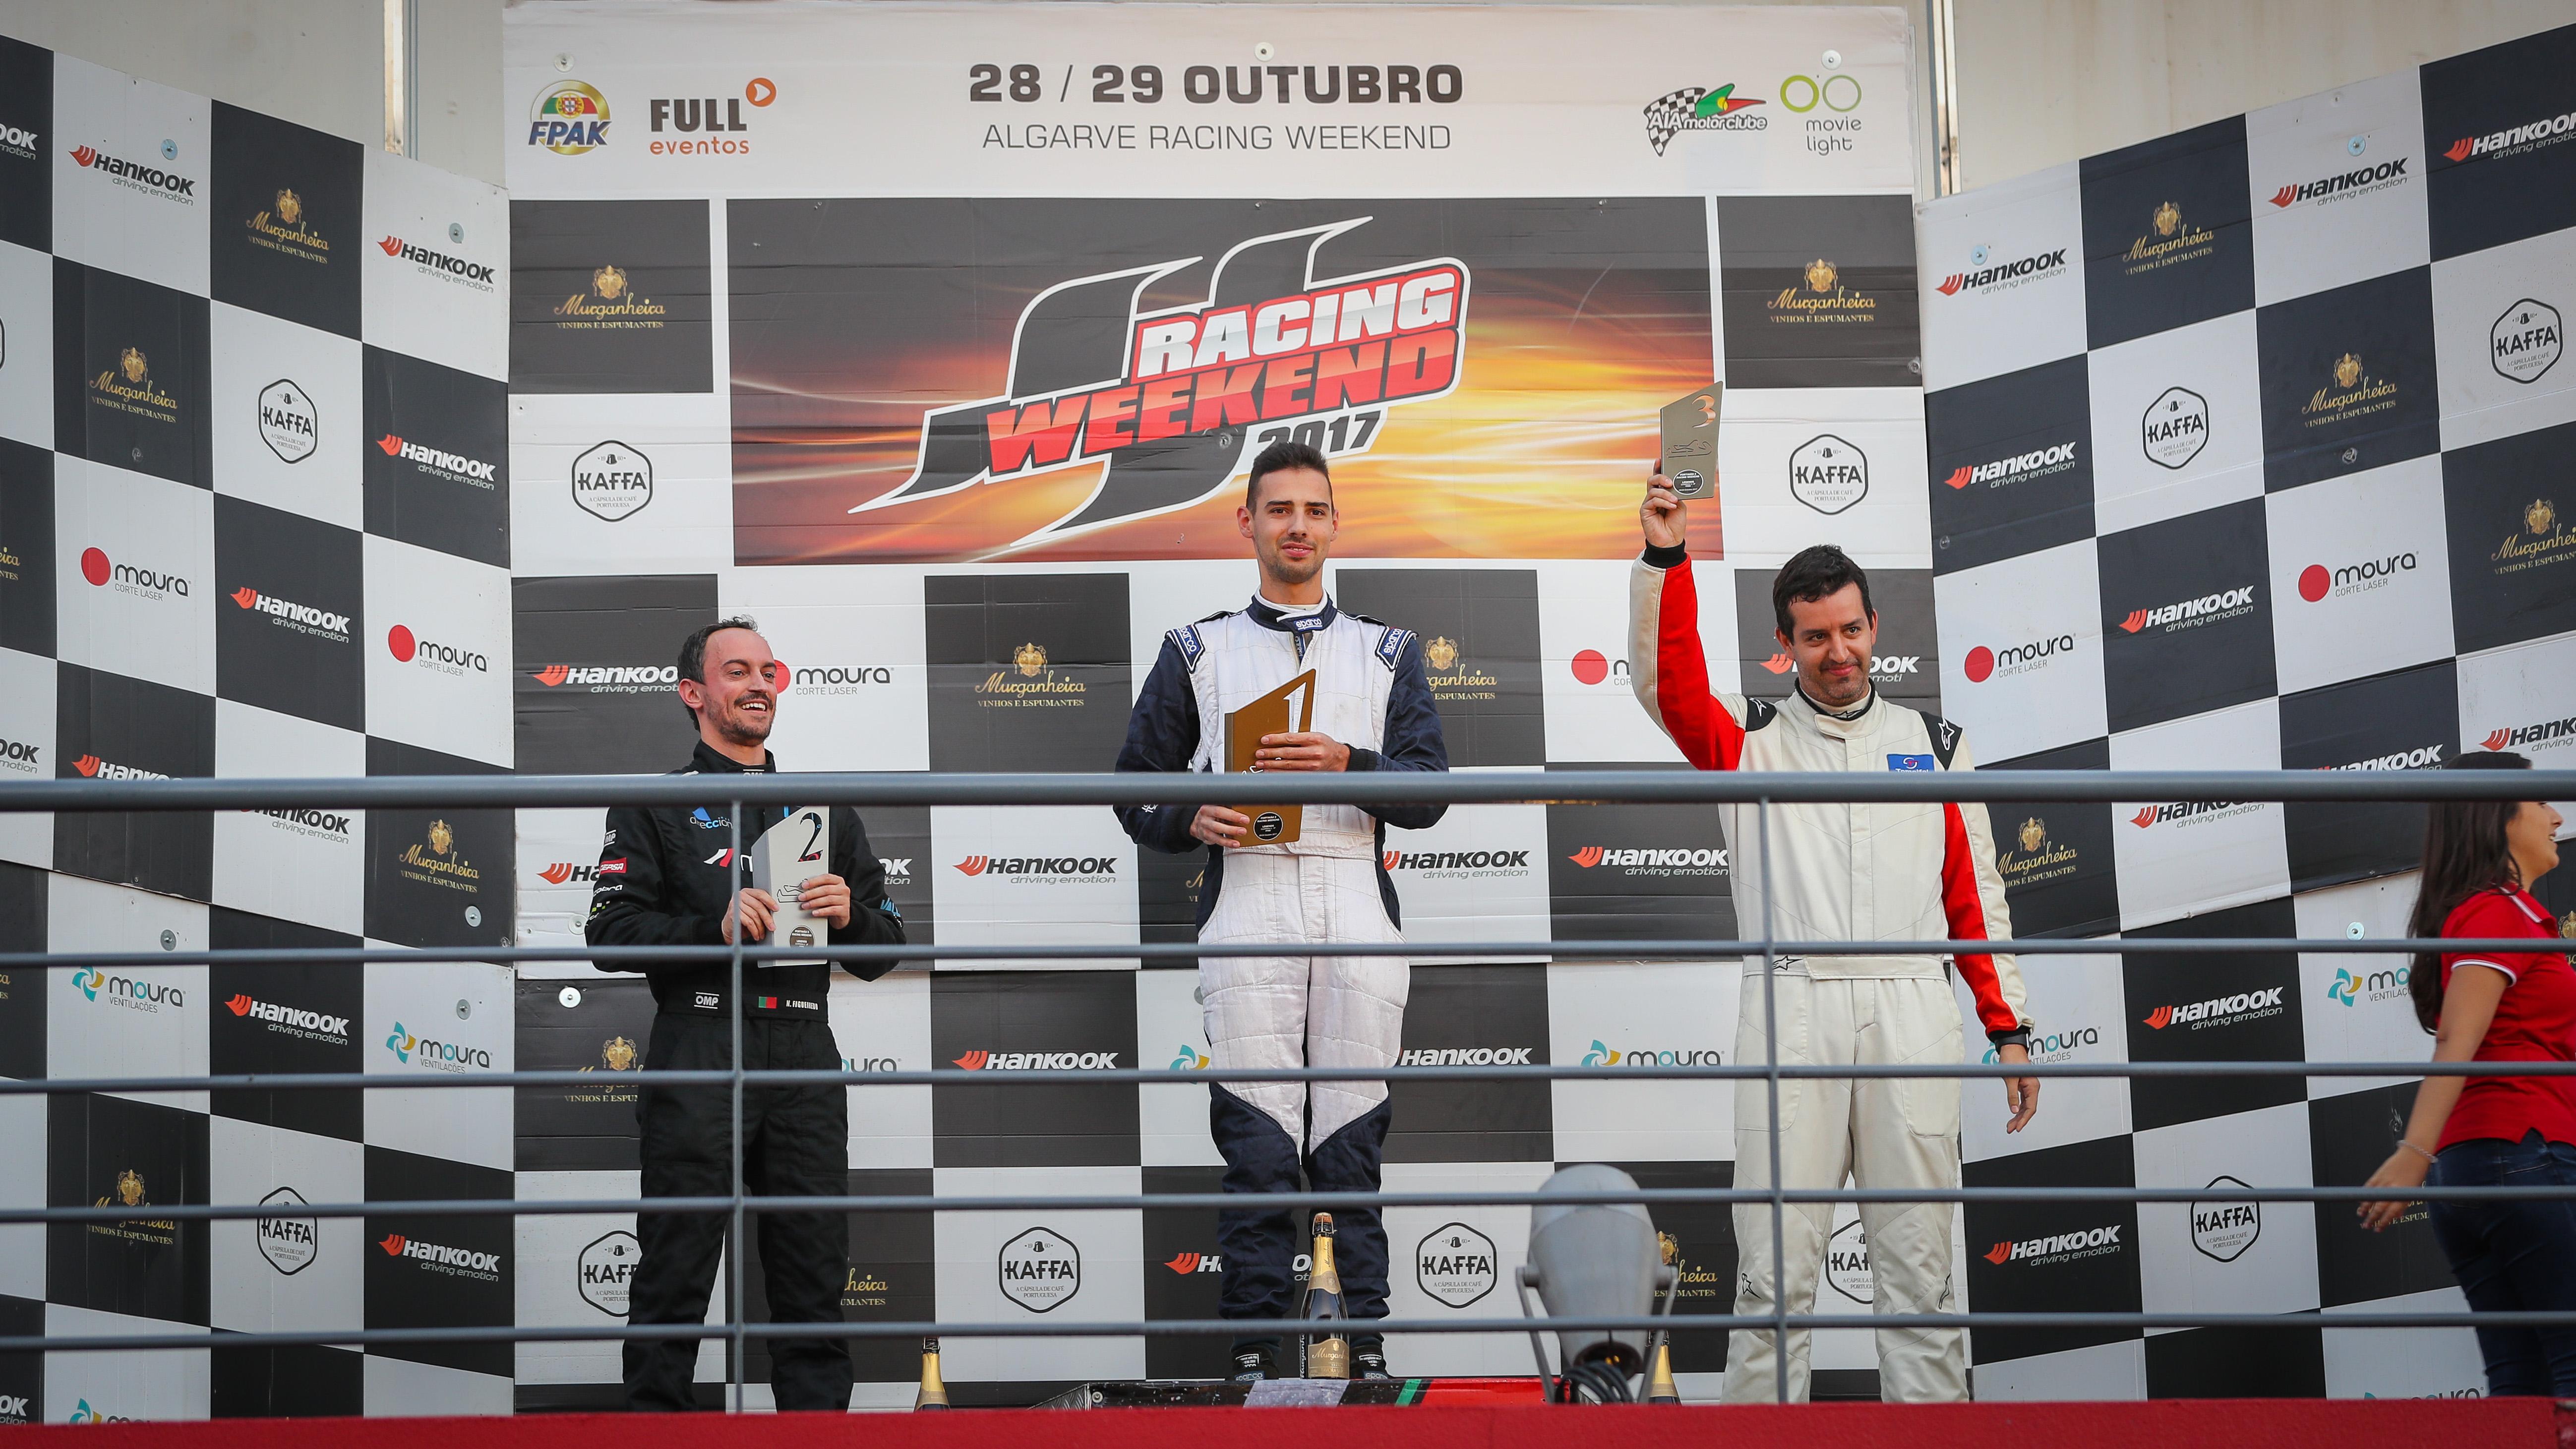 portimao podium lcc